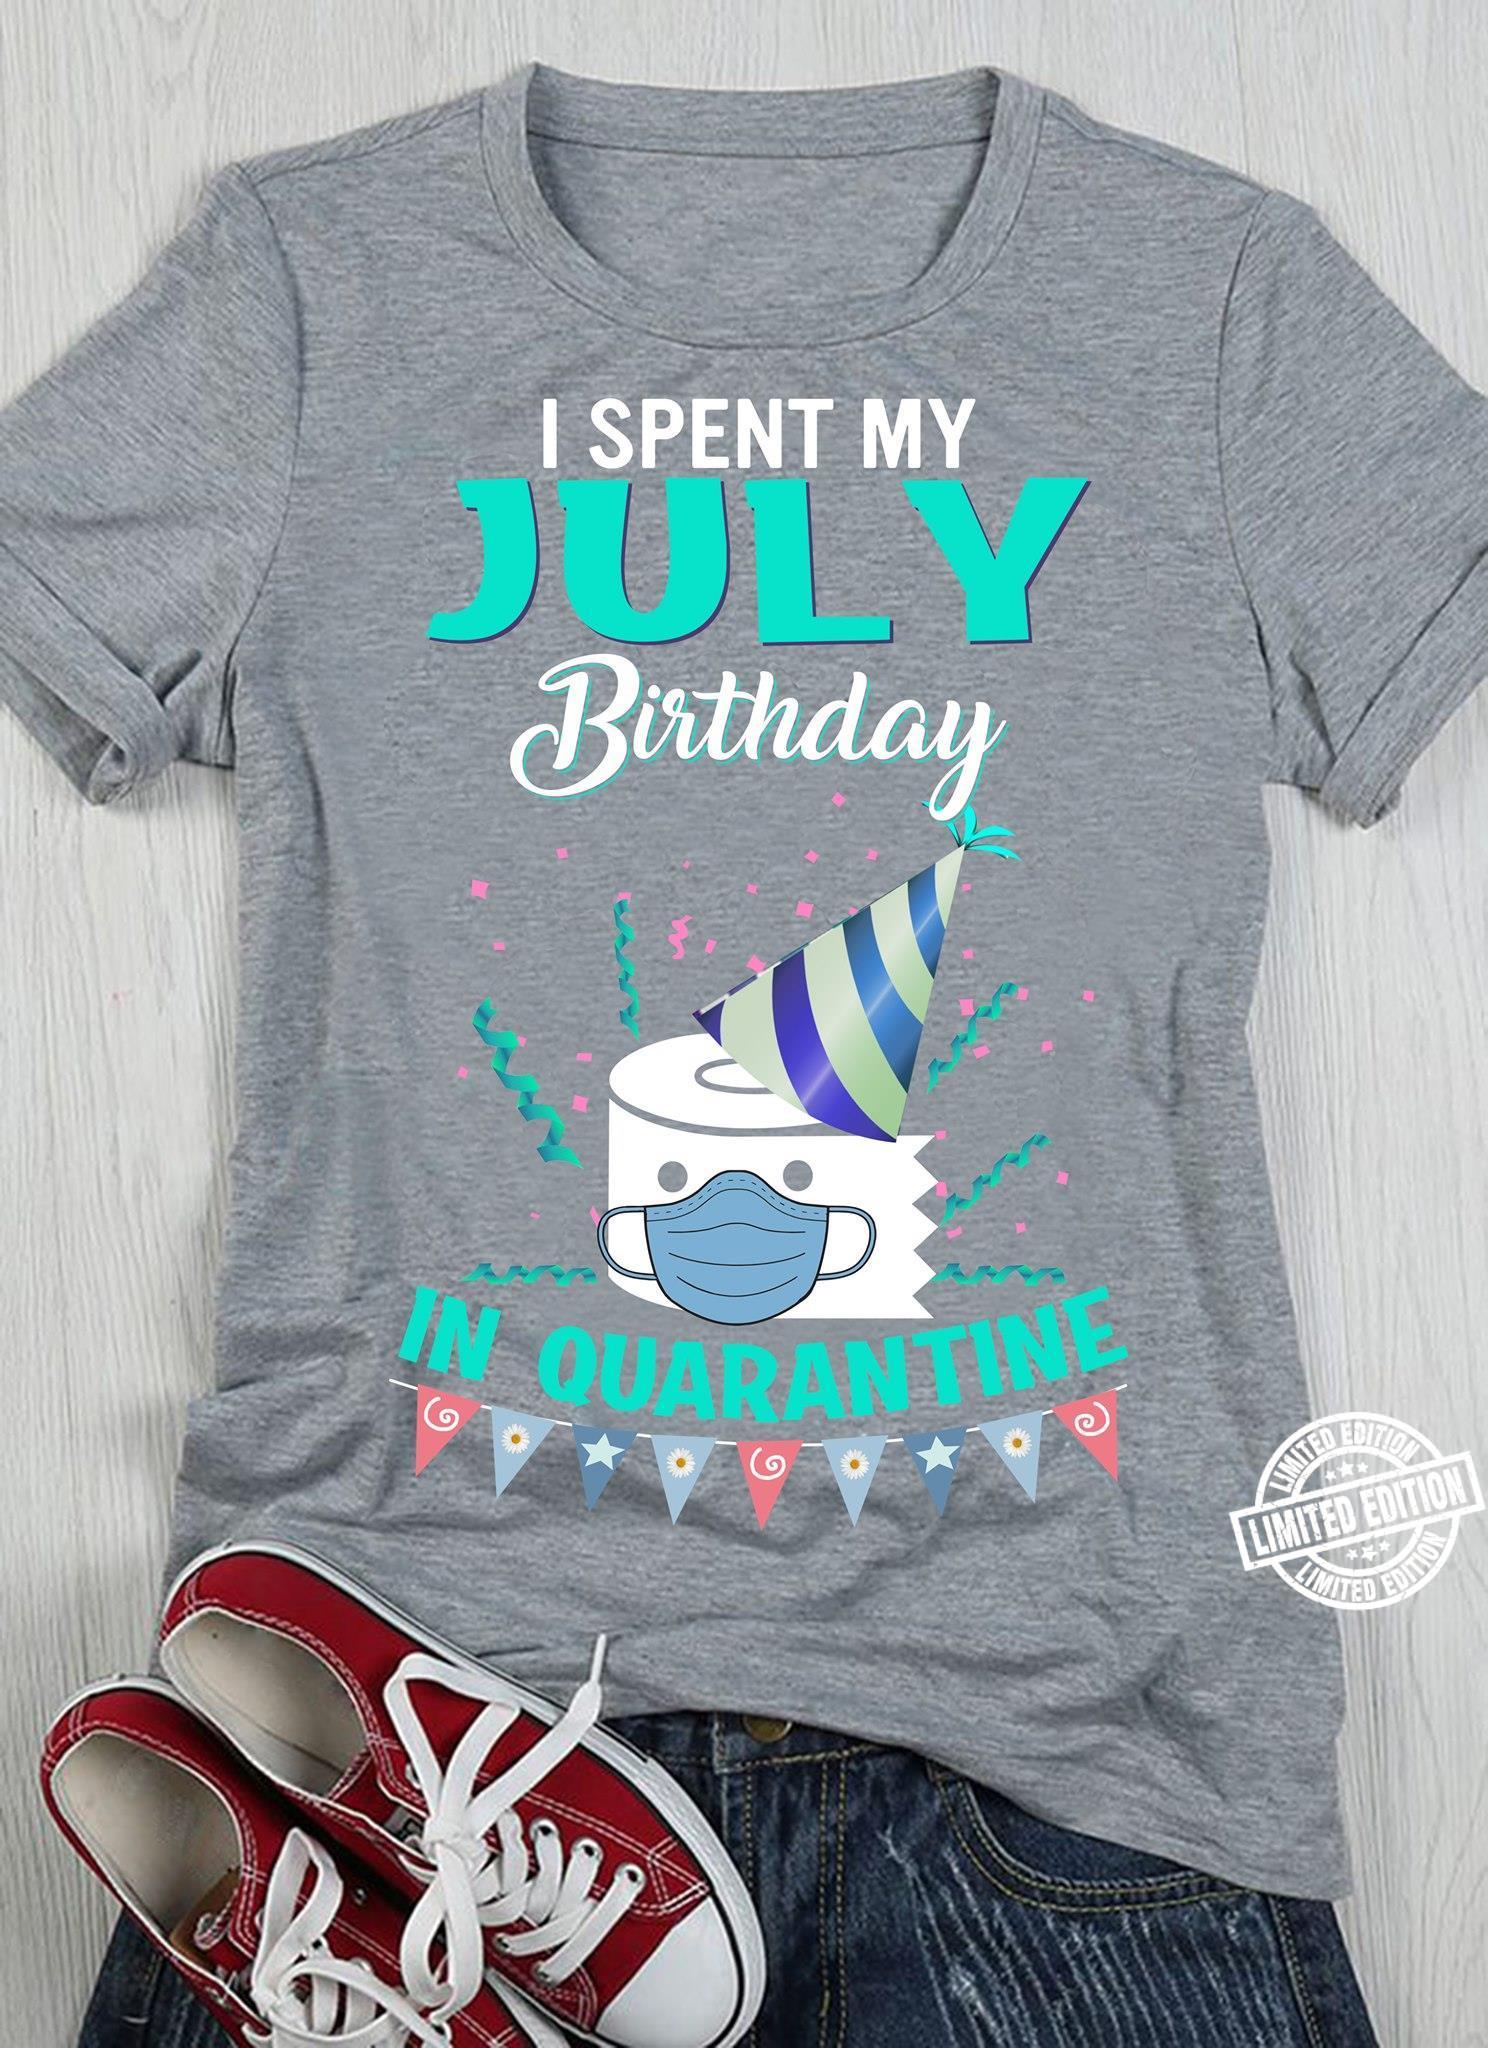 I spent my july birthday in quarantine shirt